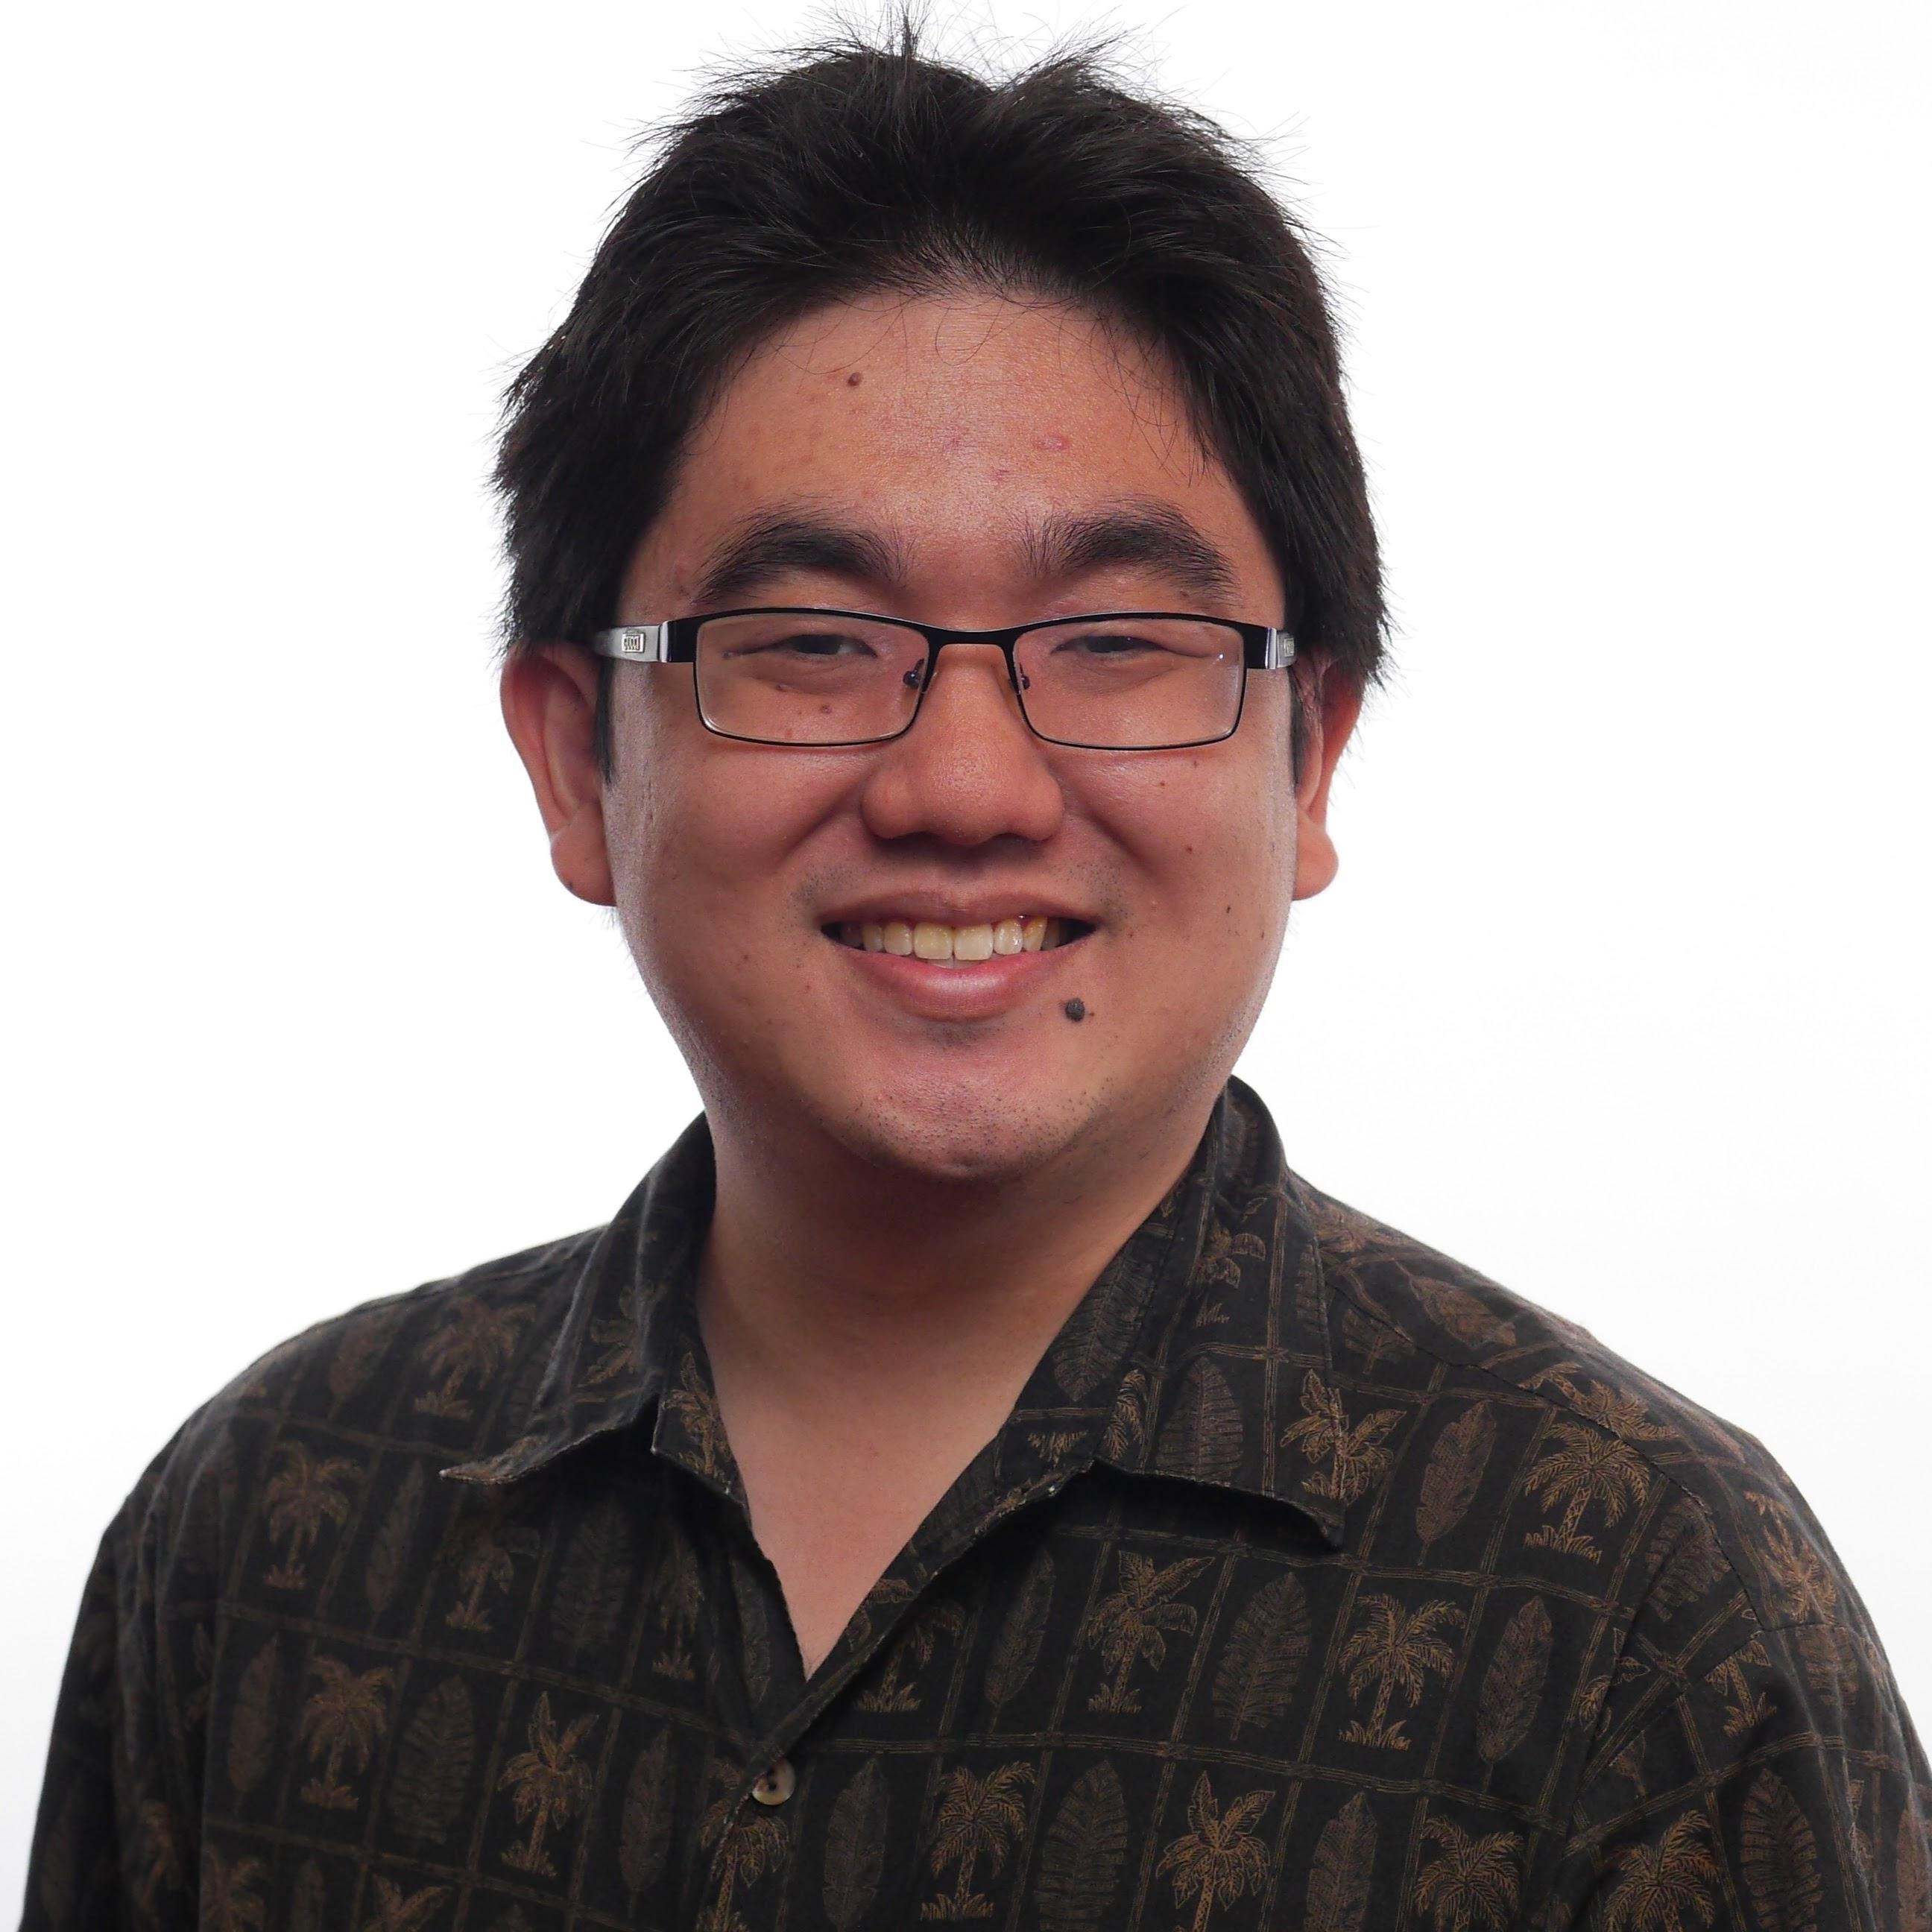 David Yamashiro